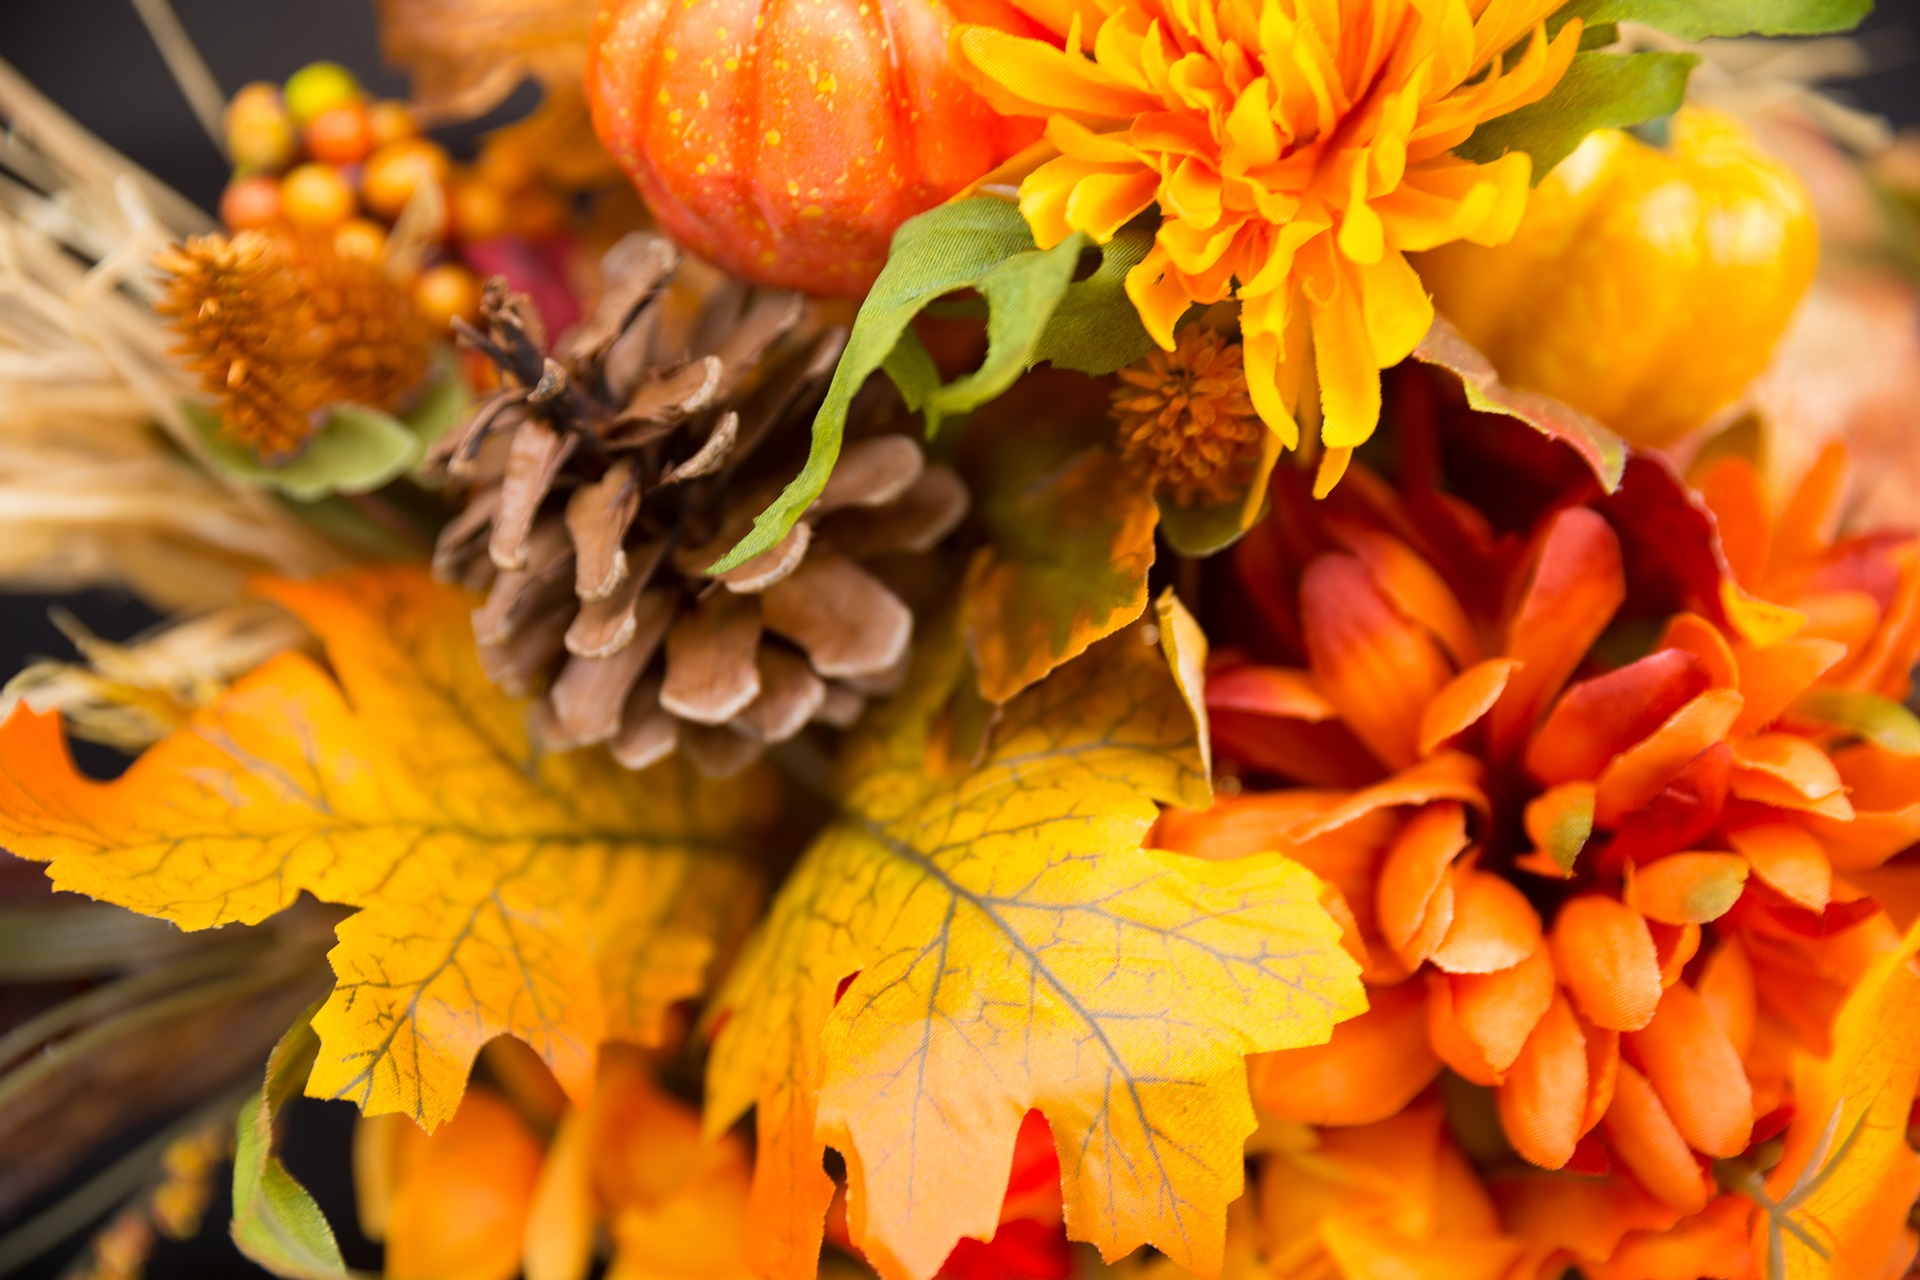 fall-flowers-2716513_1920.jpg